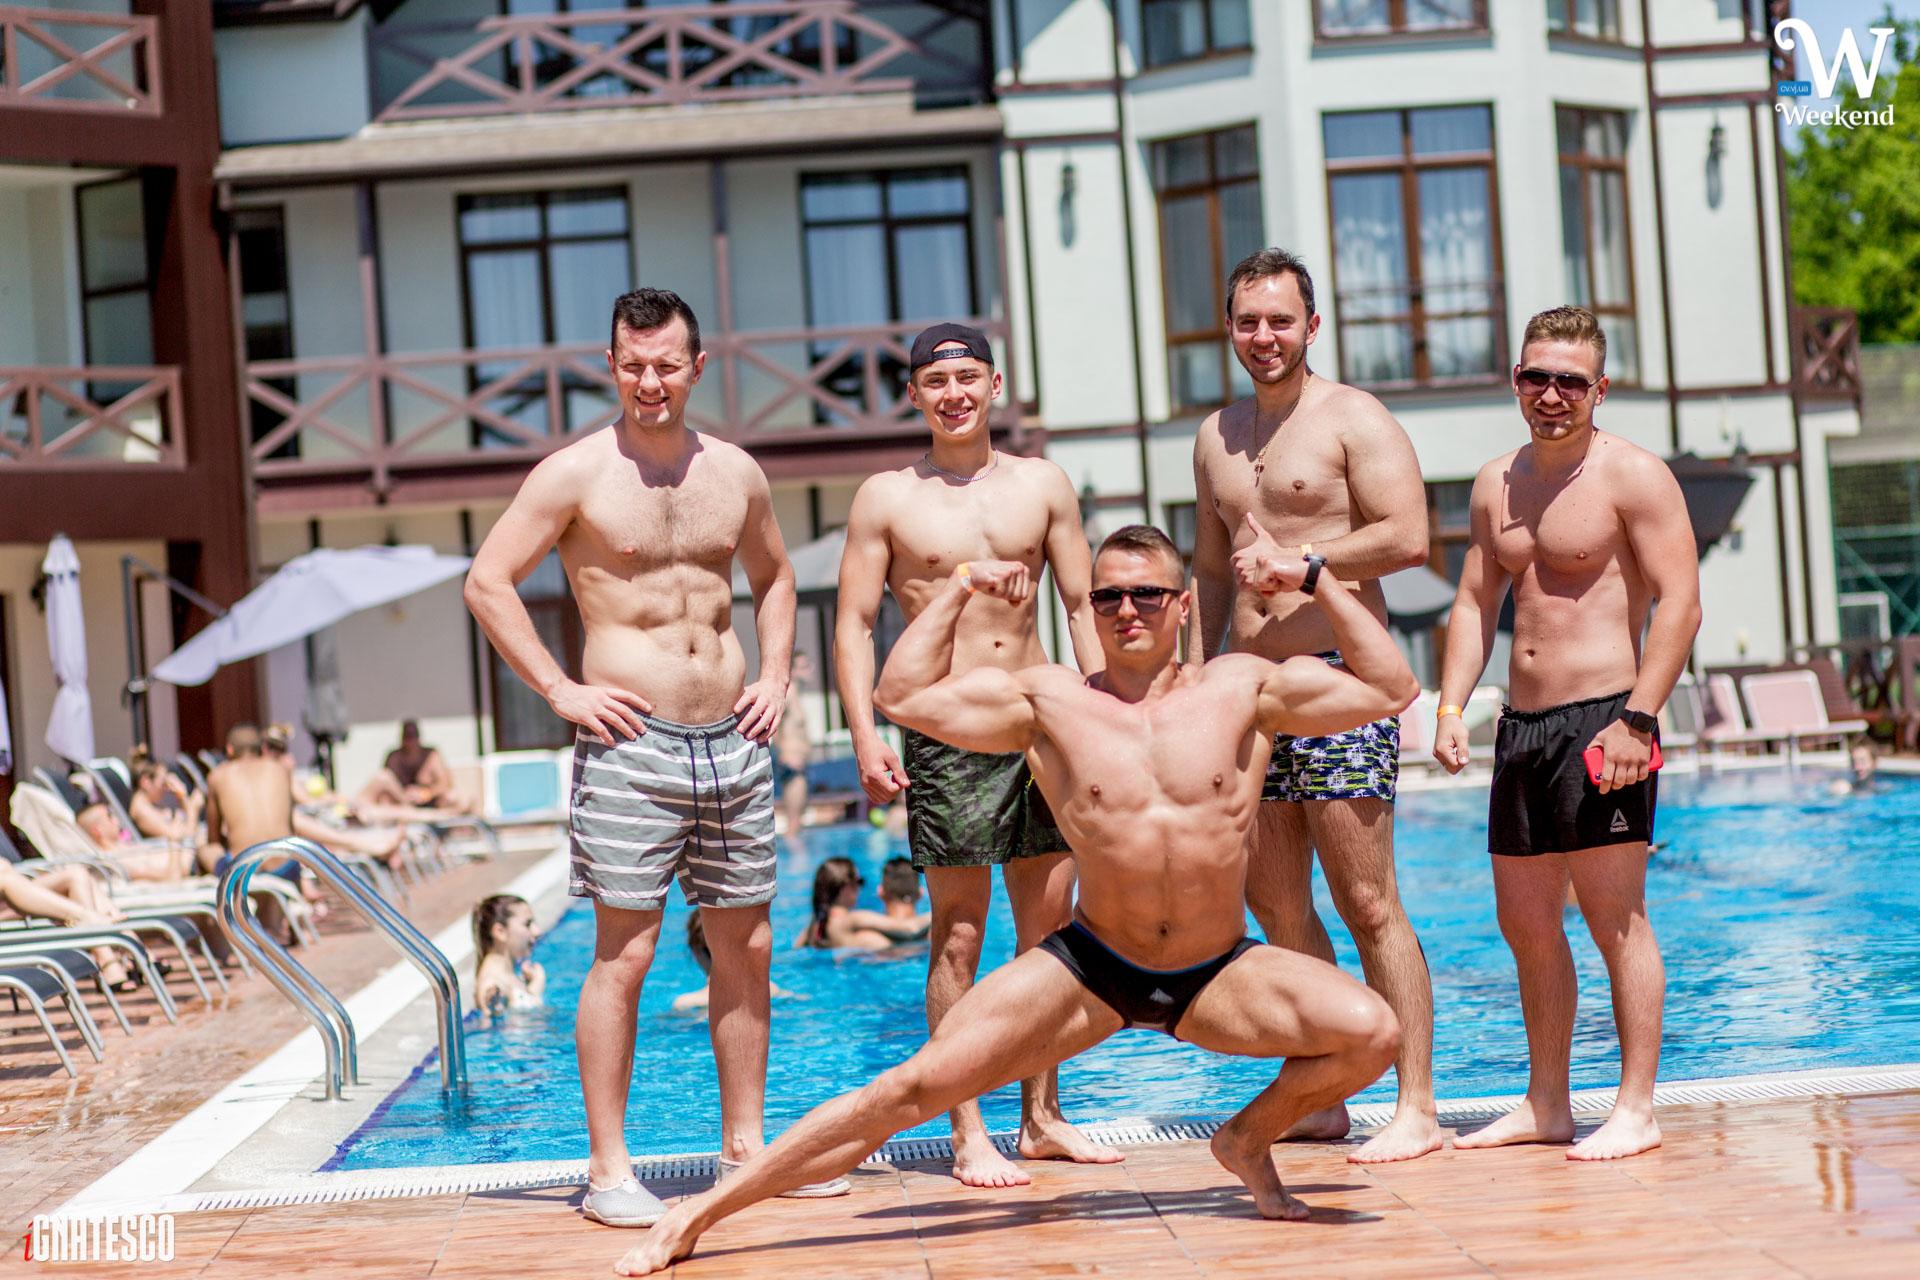 Weekend birthday pool-party в Георг парк 1 ЧАСТИНА